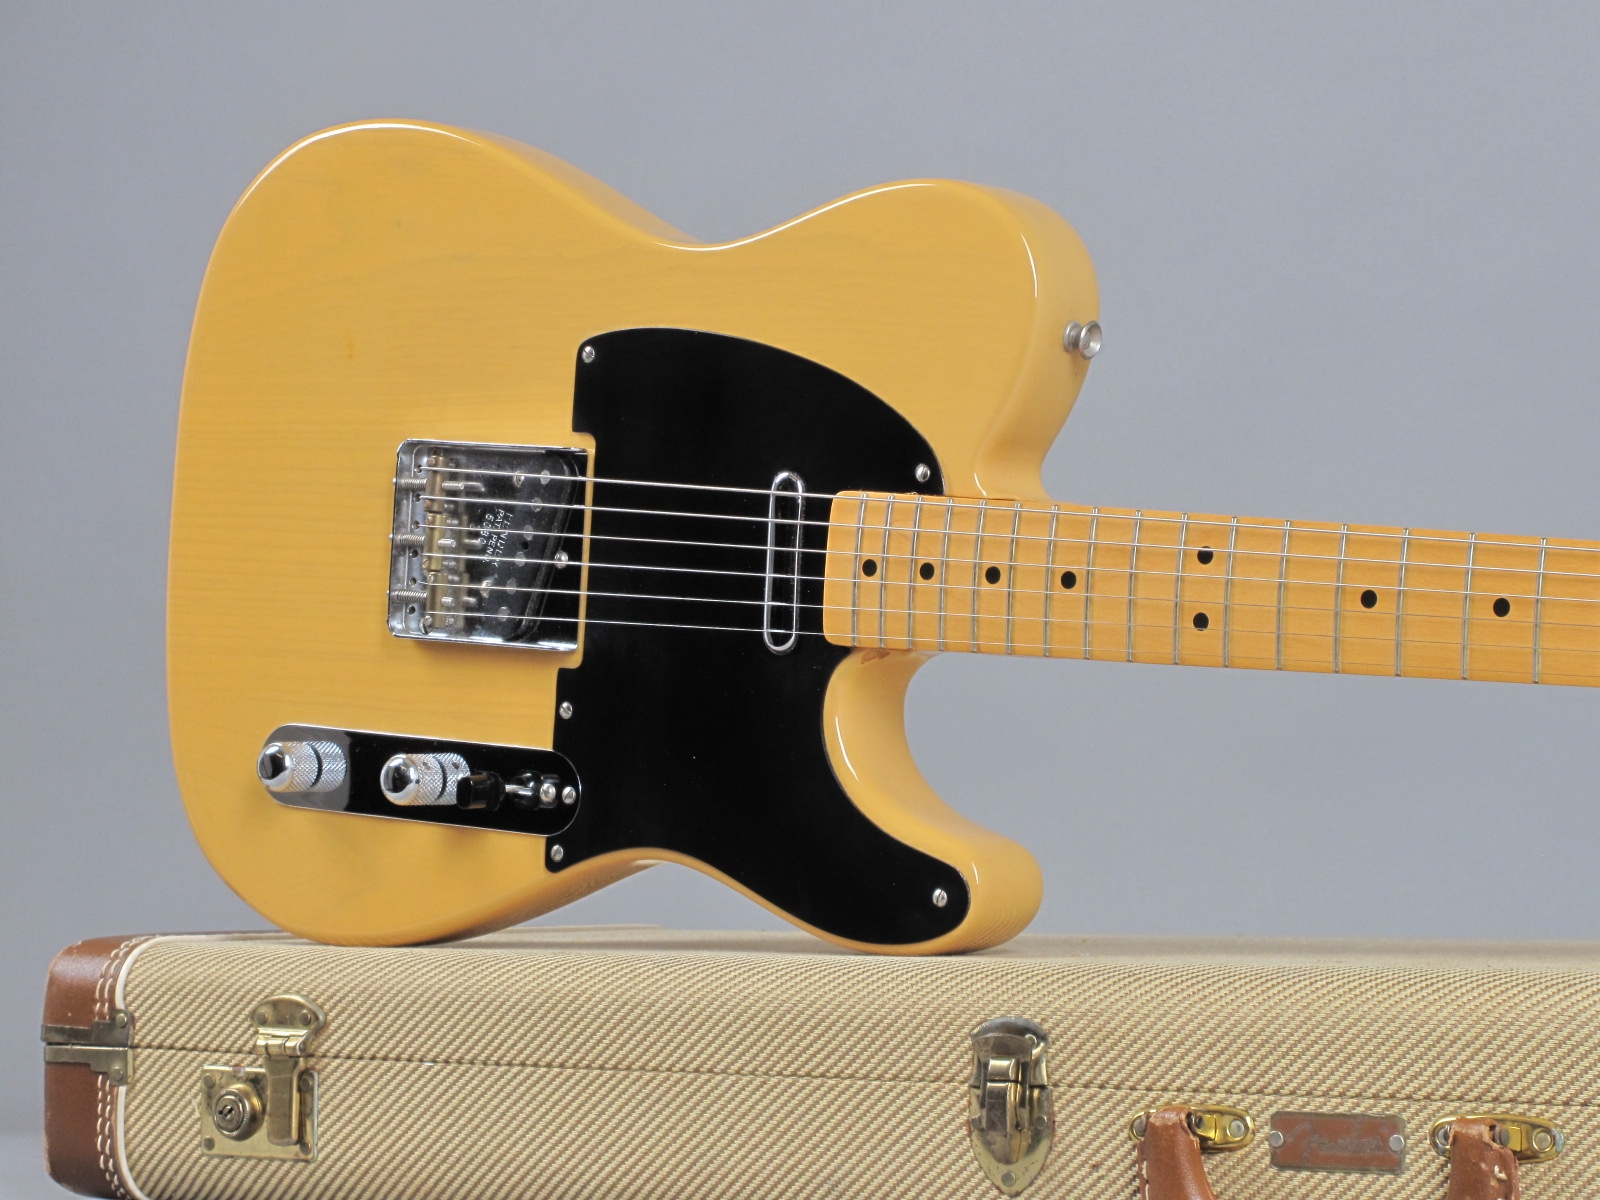 https://guitarpoint.de/app/uploads/products/1982-fender-fullerton-american-vintage-52-telecaster-blond/1987-Fender-Telecaster-52-Reissue-Blond-5080-19.jpg